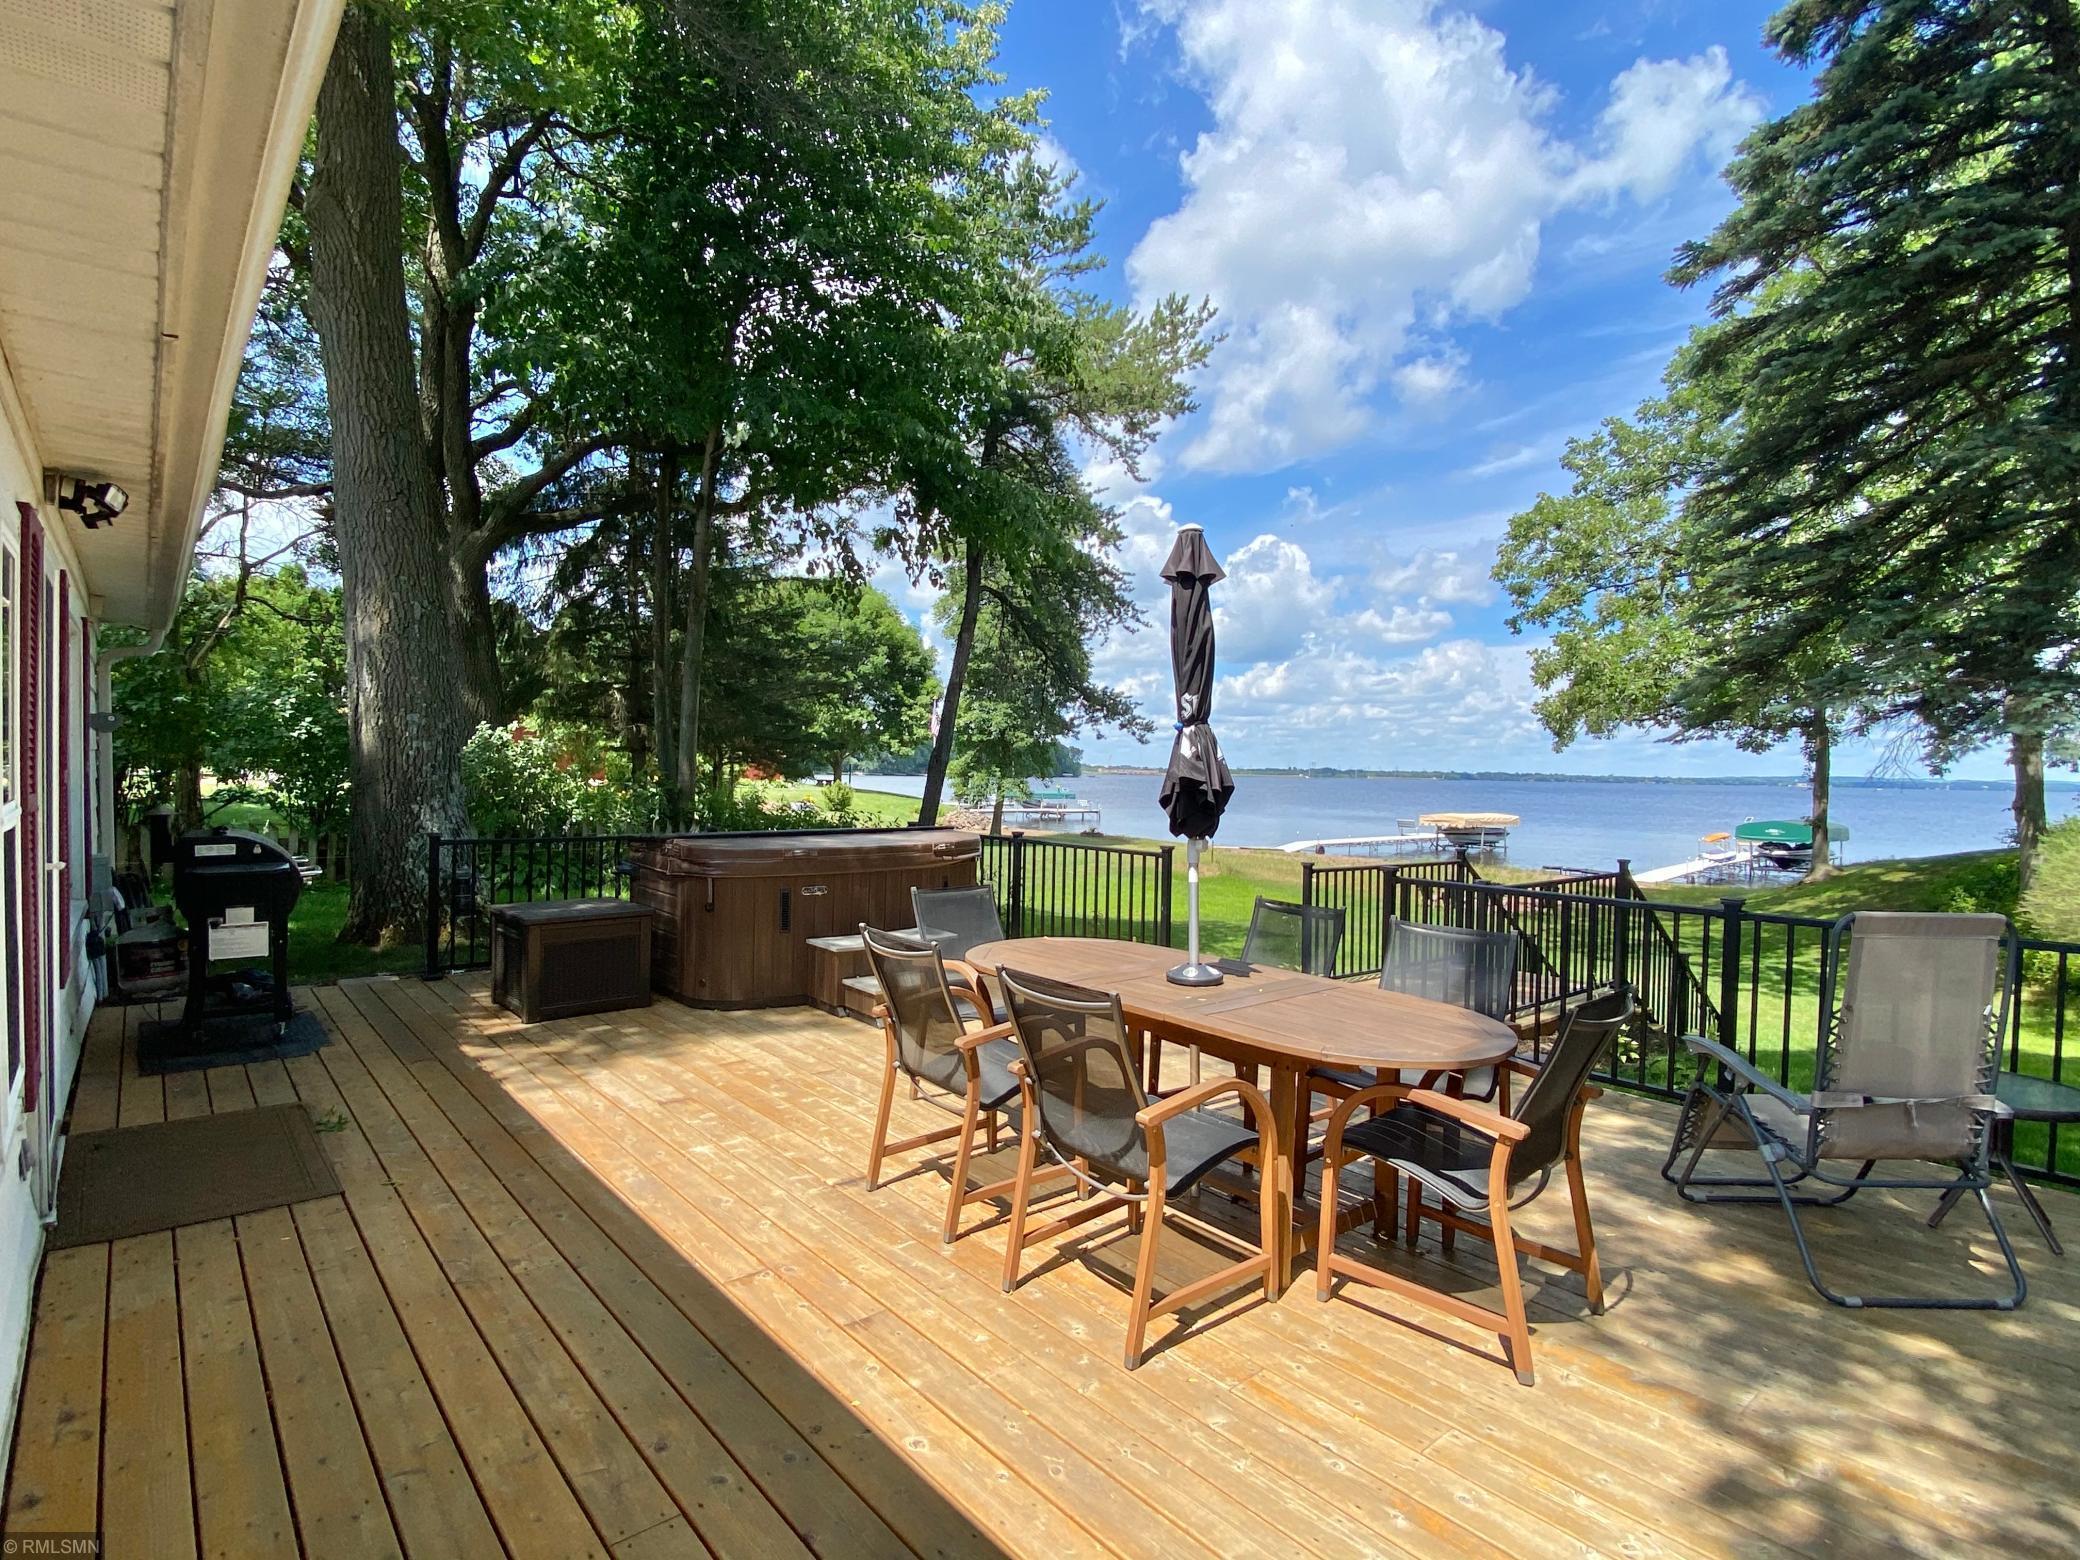 17112 59th Property Photo - Chippewa Falls, WI real estate listing